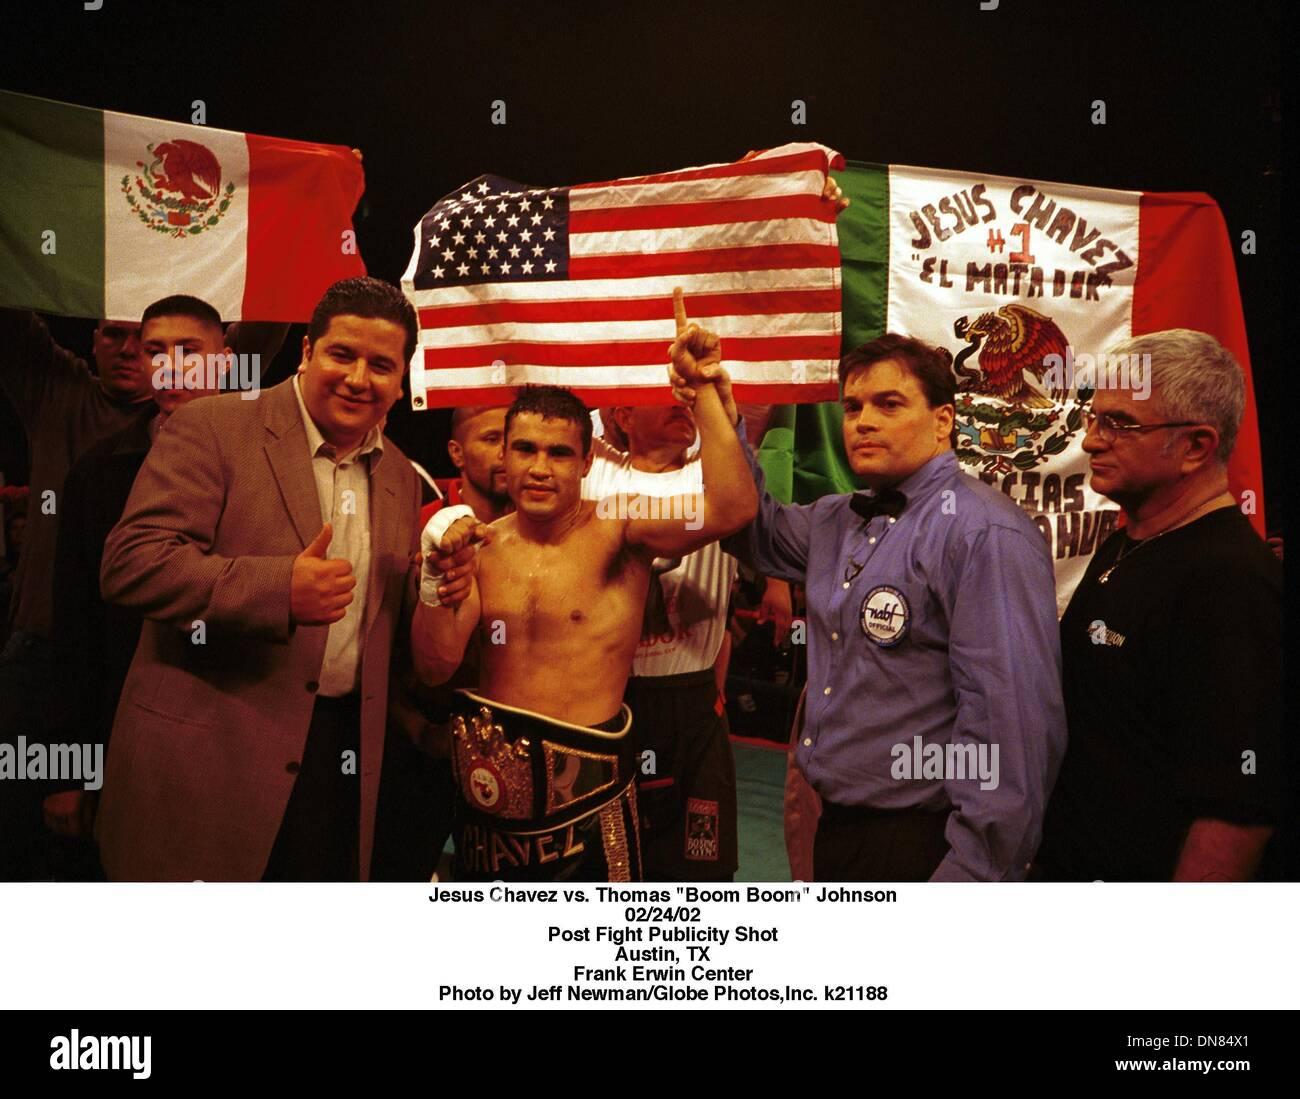 Feb. 24, 2001 - Jesus Chavez vs. Thomas ''Boom Boom'' Johnson.02/24/02.Post Fight Publicity Shot.Austin, TX.Frank Erwin Center. Jeff Newman/   k21188(Credit Image: © Globe Photos/ZUMAPRESS.com) - Stock Image